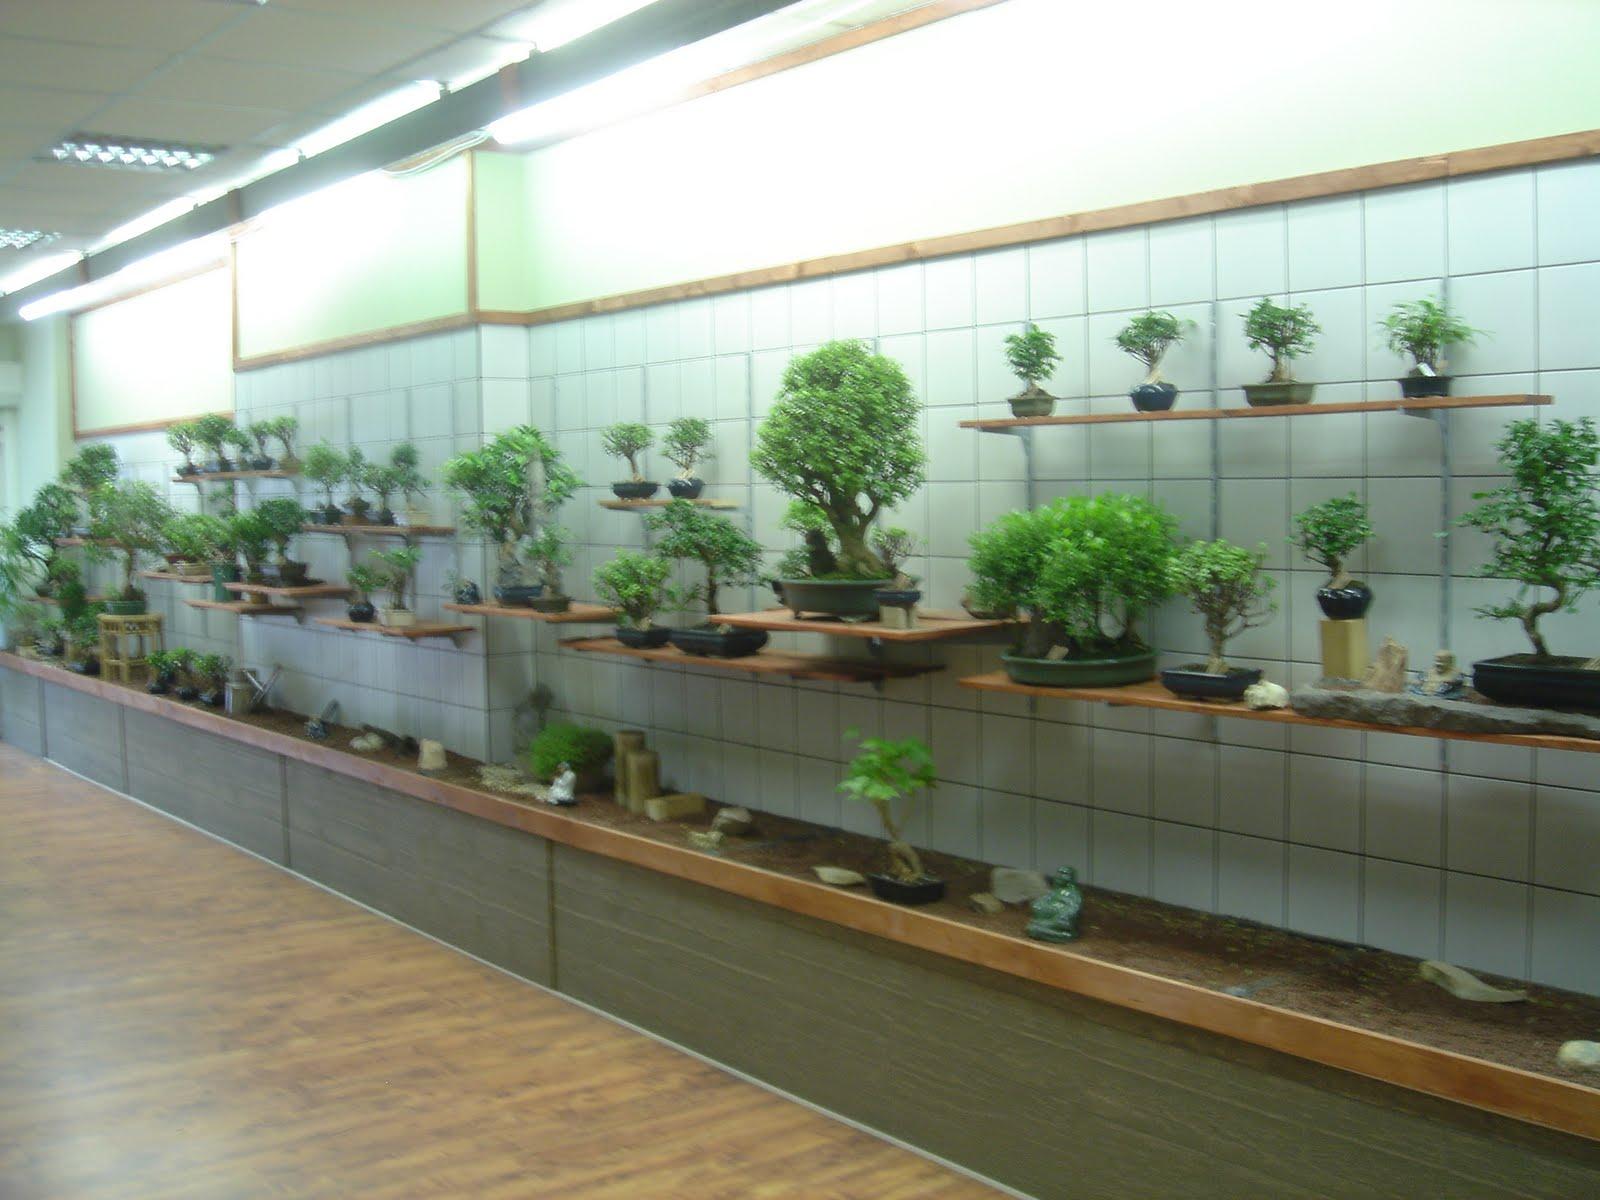 bonsai shop berlin bonsai blog yoske nishiumi bonsai concept berlin bohnenhase bento j store. Black Bedroom Furniture Sets. Home Design Ideas